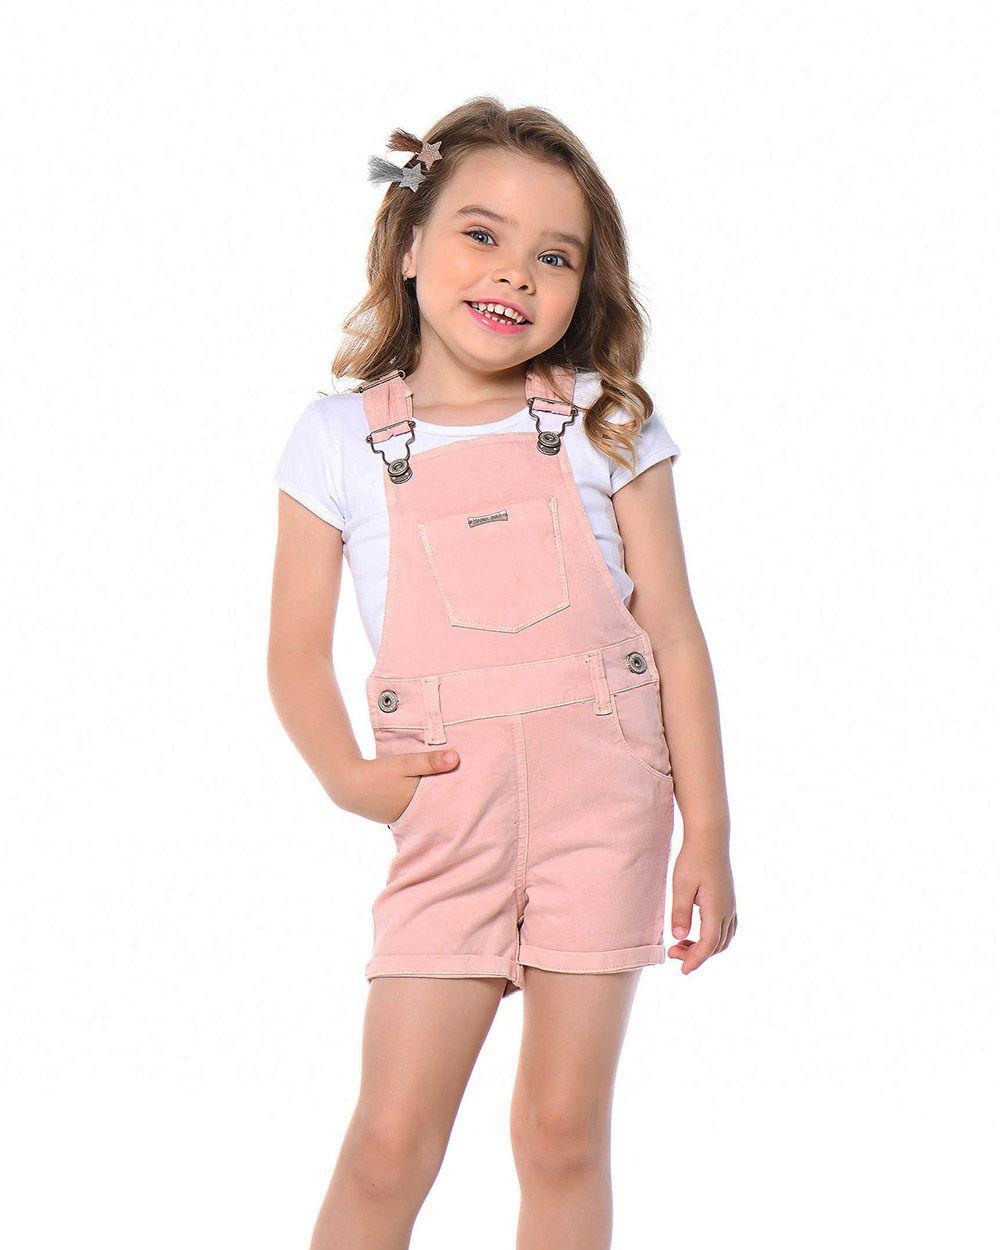 Jardineira Menina Mania Kids Rosa 50719Rs